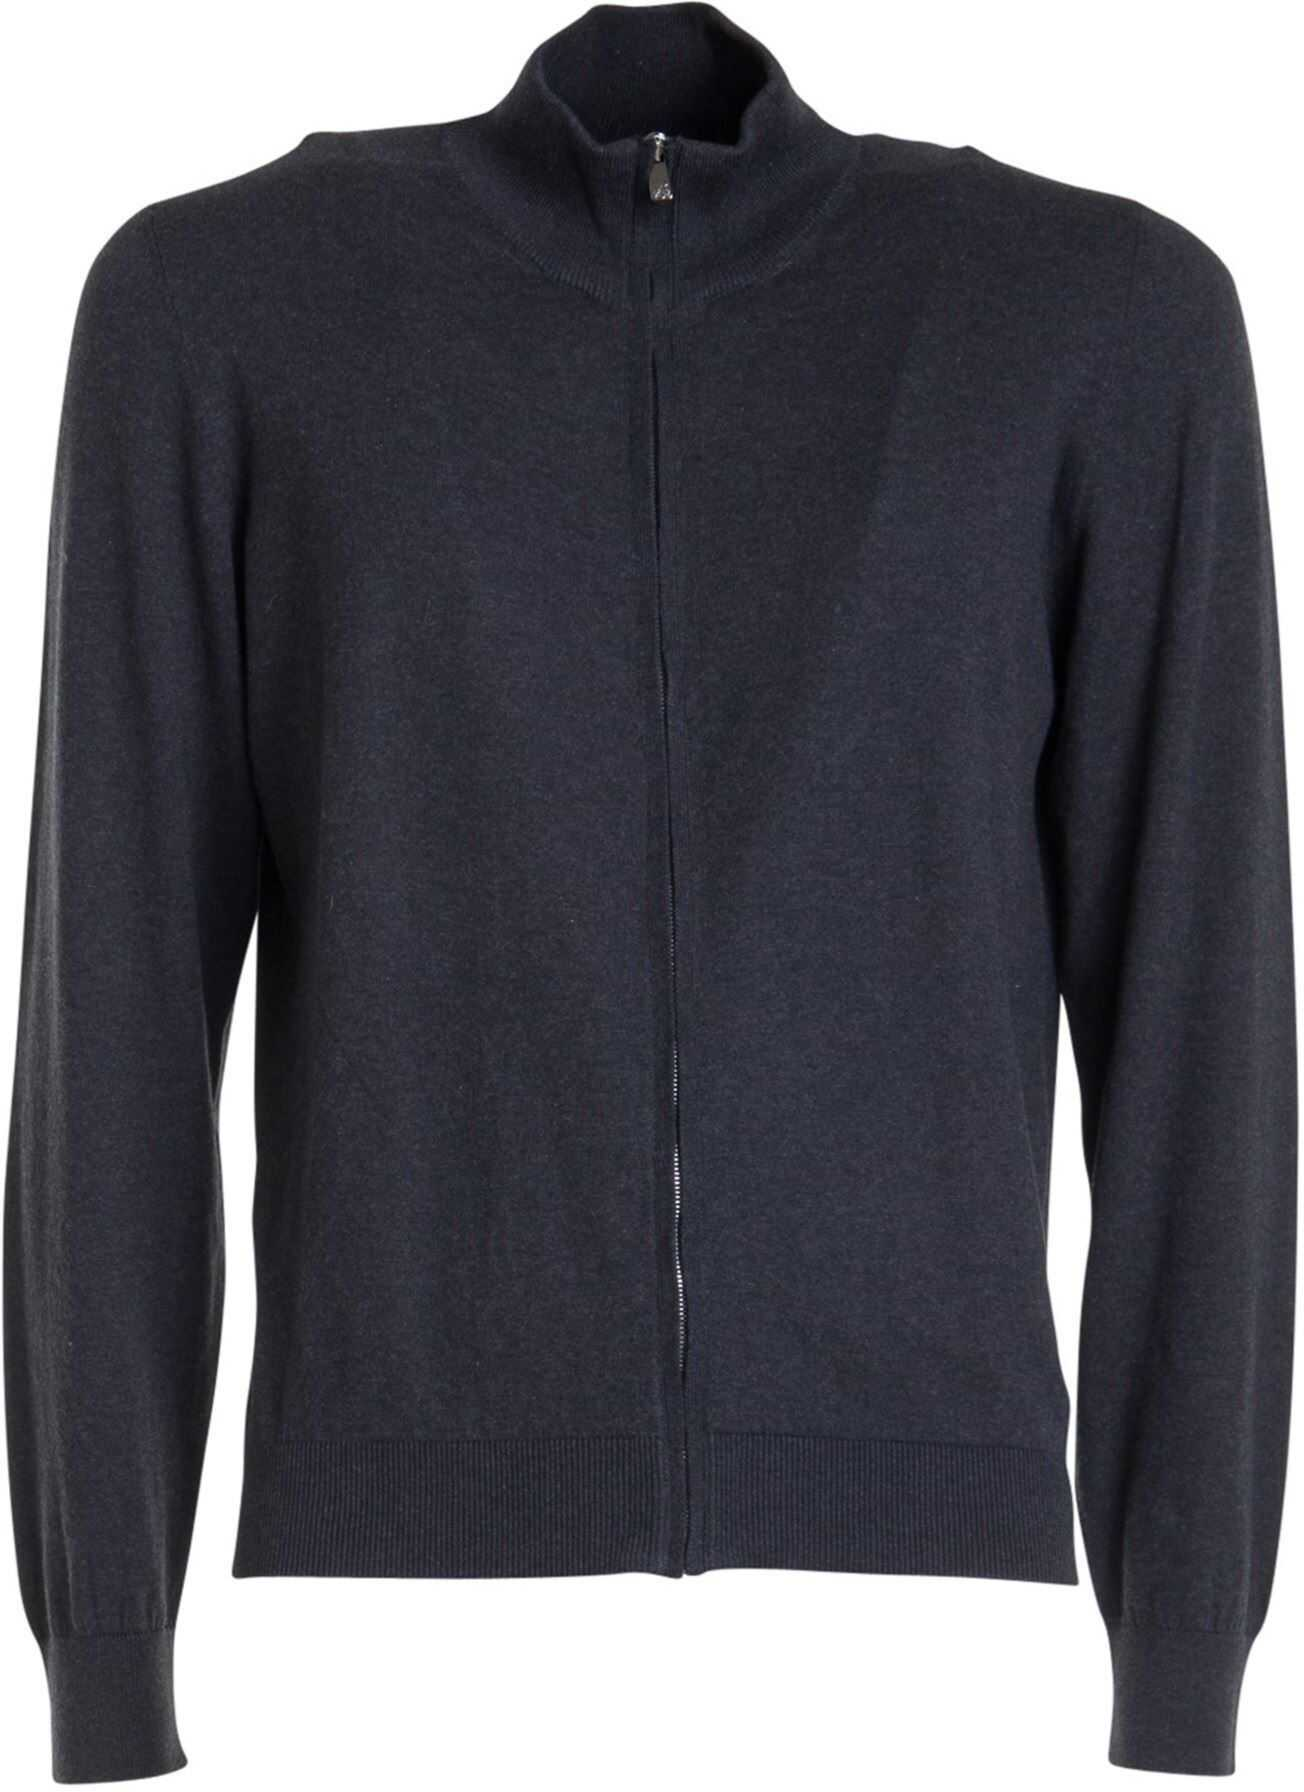 CORNELIANI Cotton-Cashmere Blend Cardigan Grey imagine